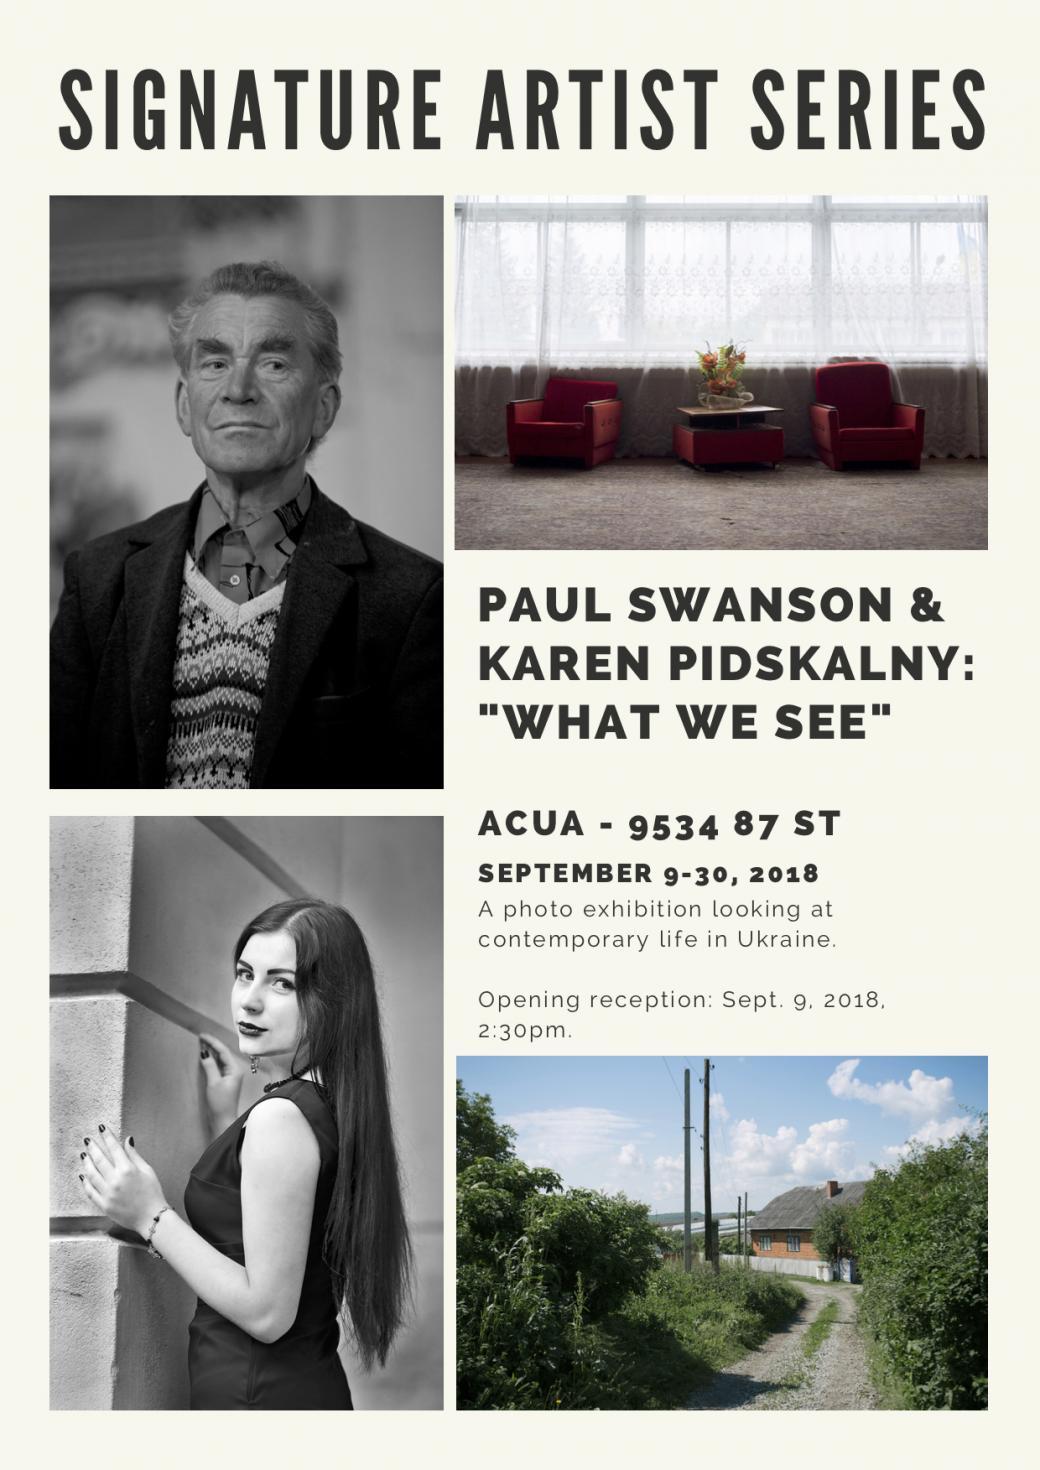 """What We See"" - Paul Swanson & Karen Pidskalny"